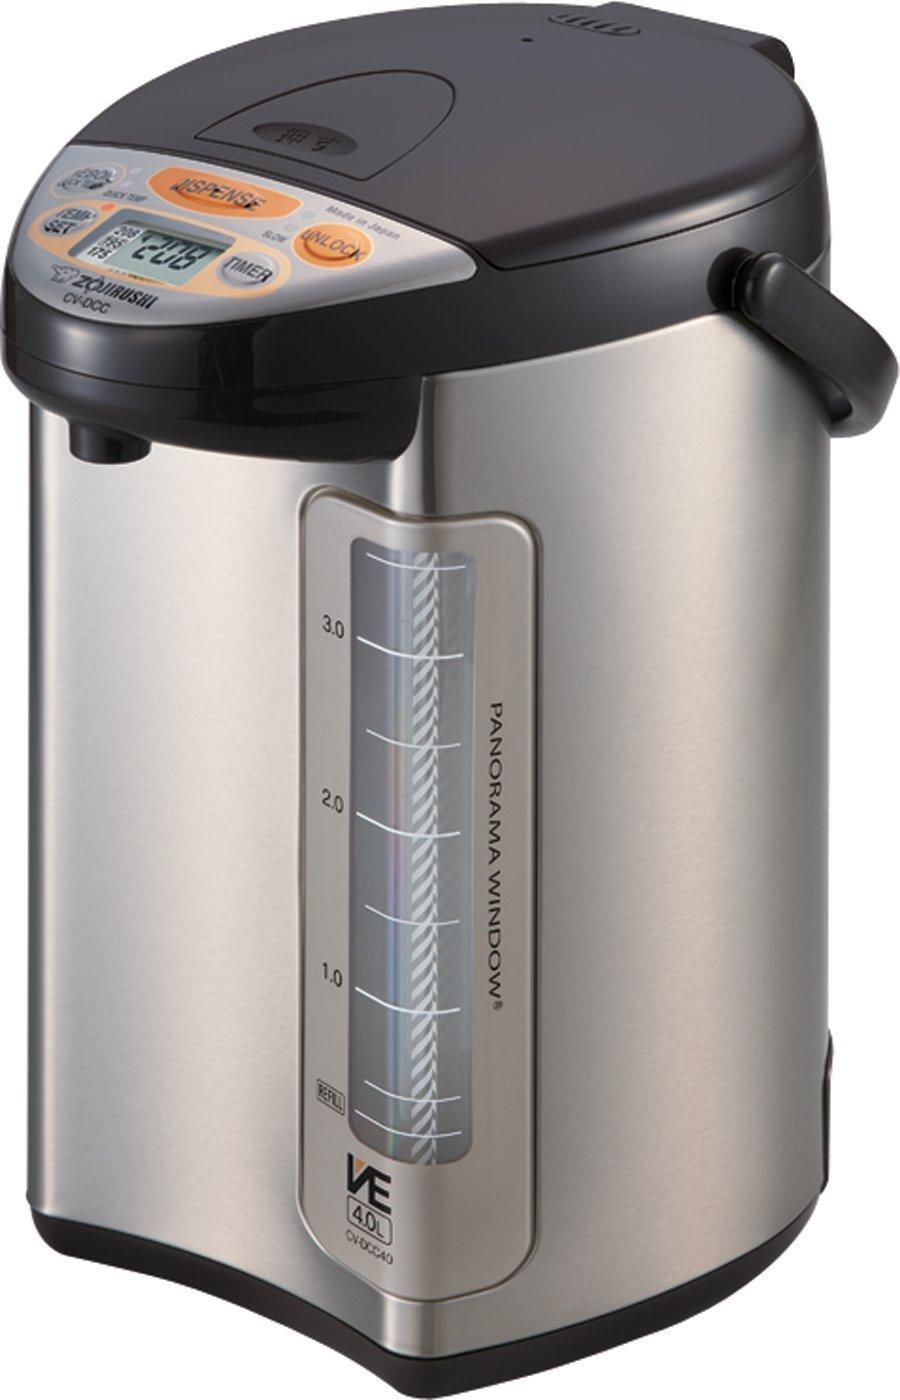 Zojirushi 586361-CV-DCC40XT America Corporation Ve Hybrid Water Boiler And Warmer, 4-Liter, Stainless Dark Brown (Renewed)